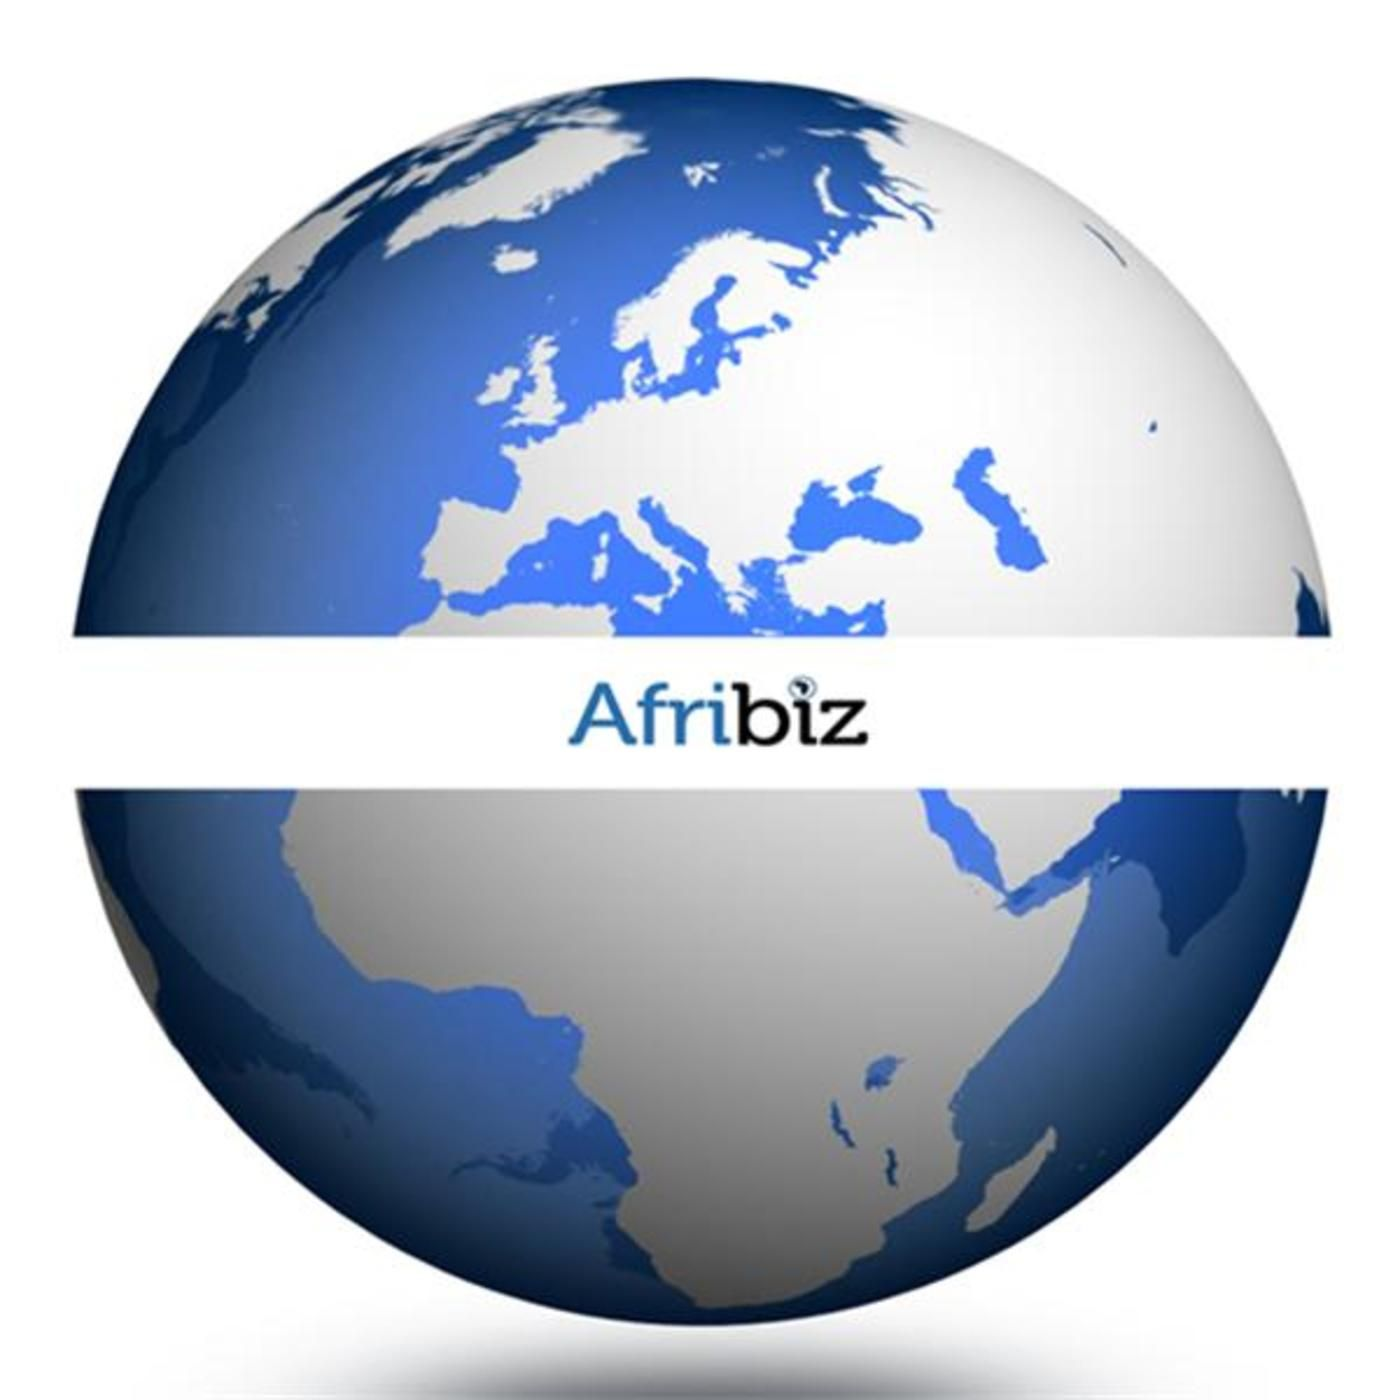 Afribiz: Business & Investment in Africa